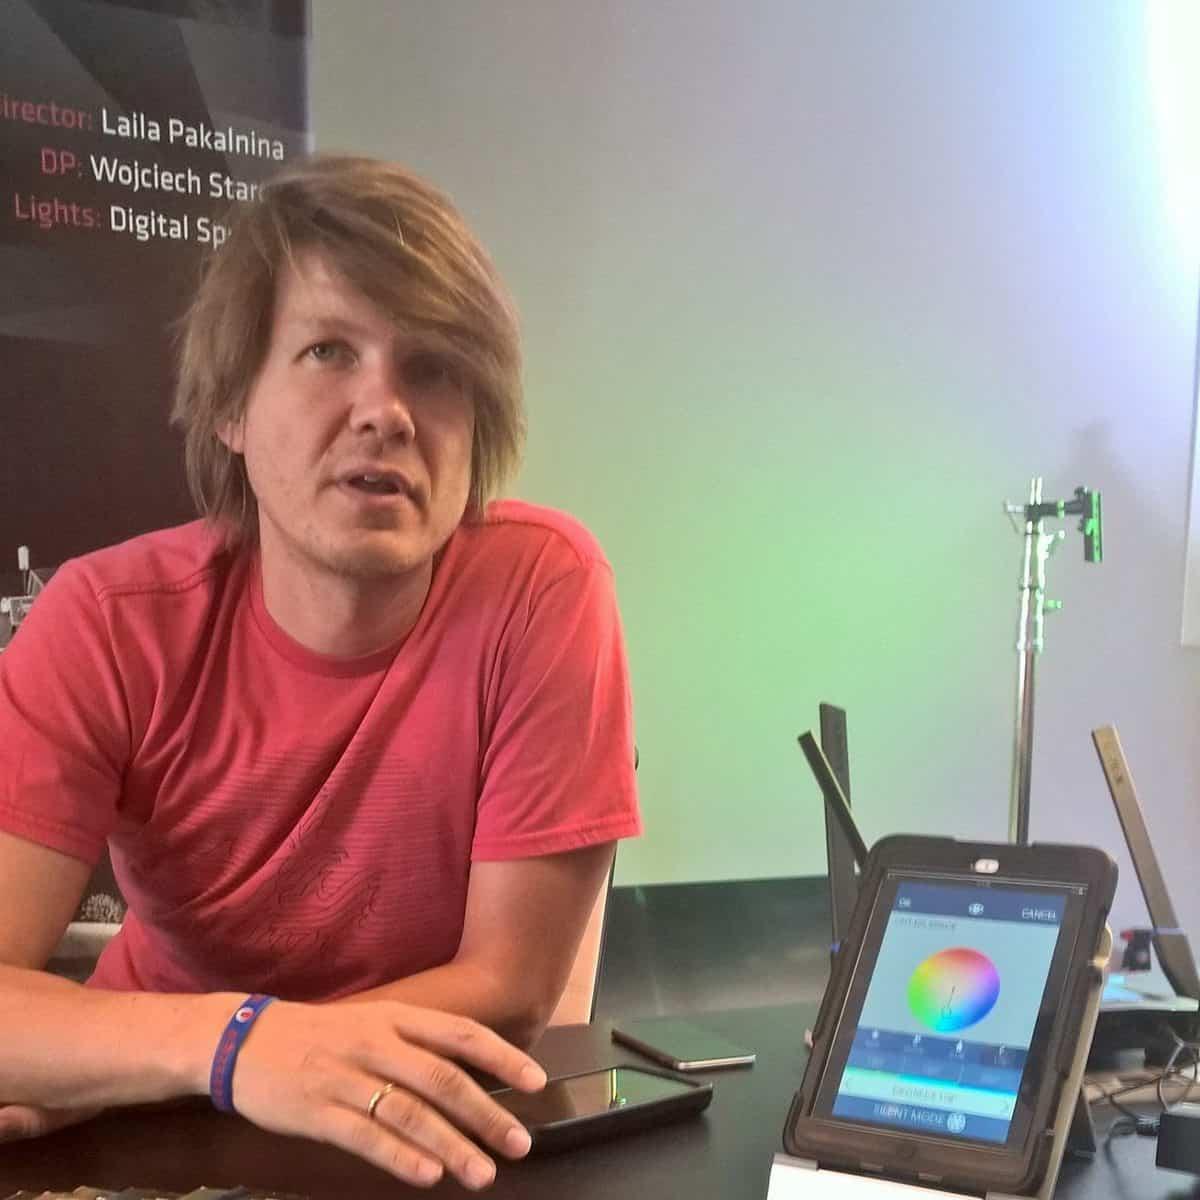 Digital Sputnik CEO Kaur Kallas gives an app demonstration